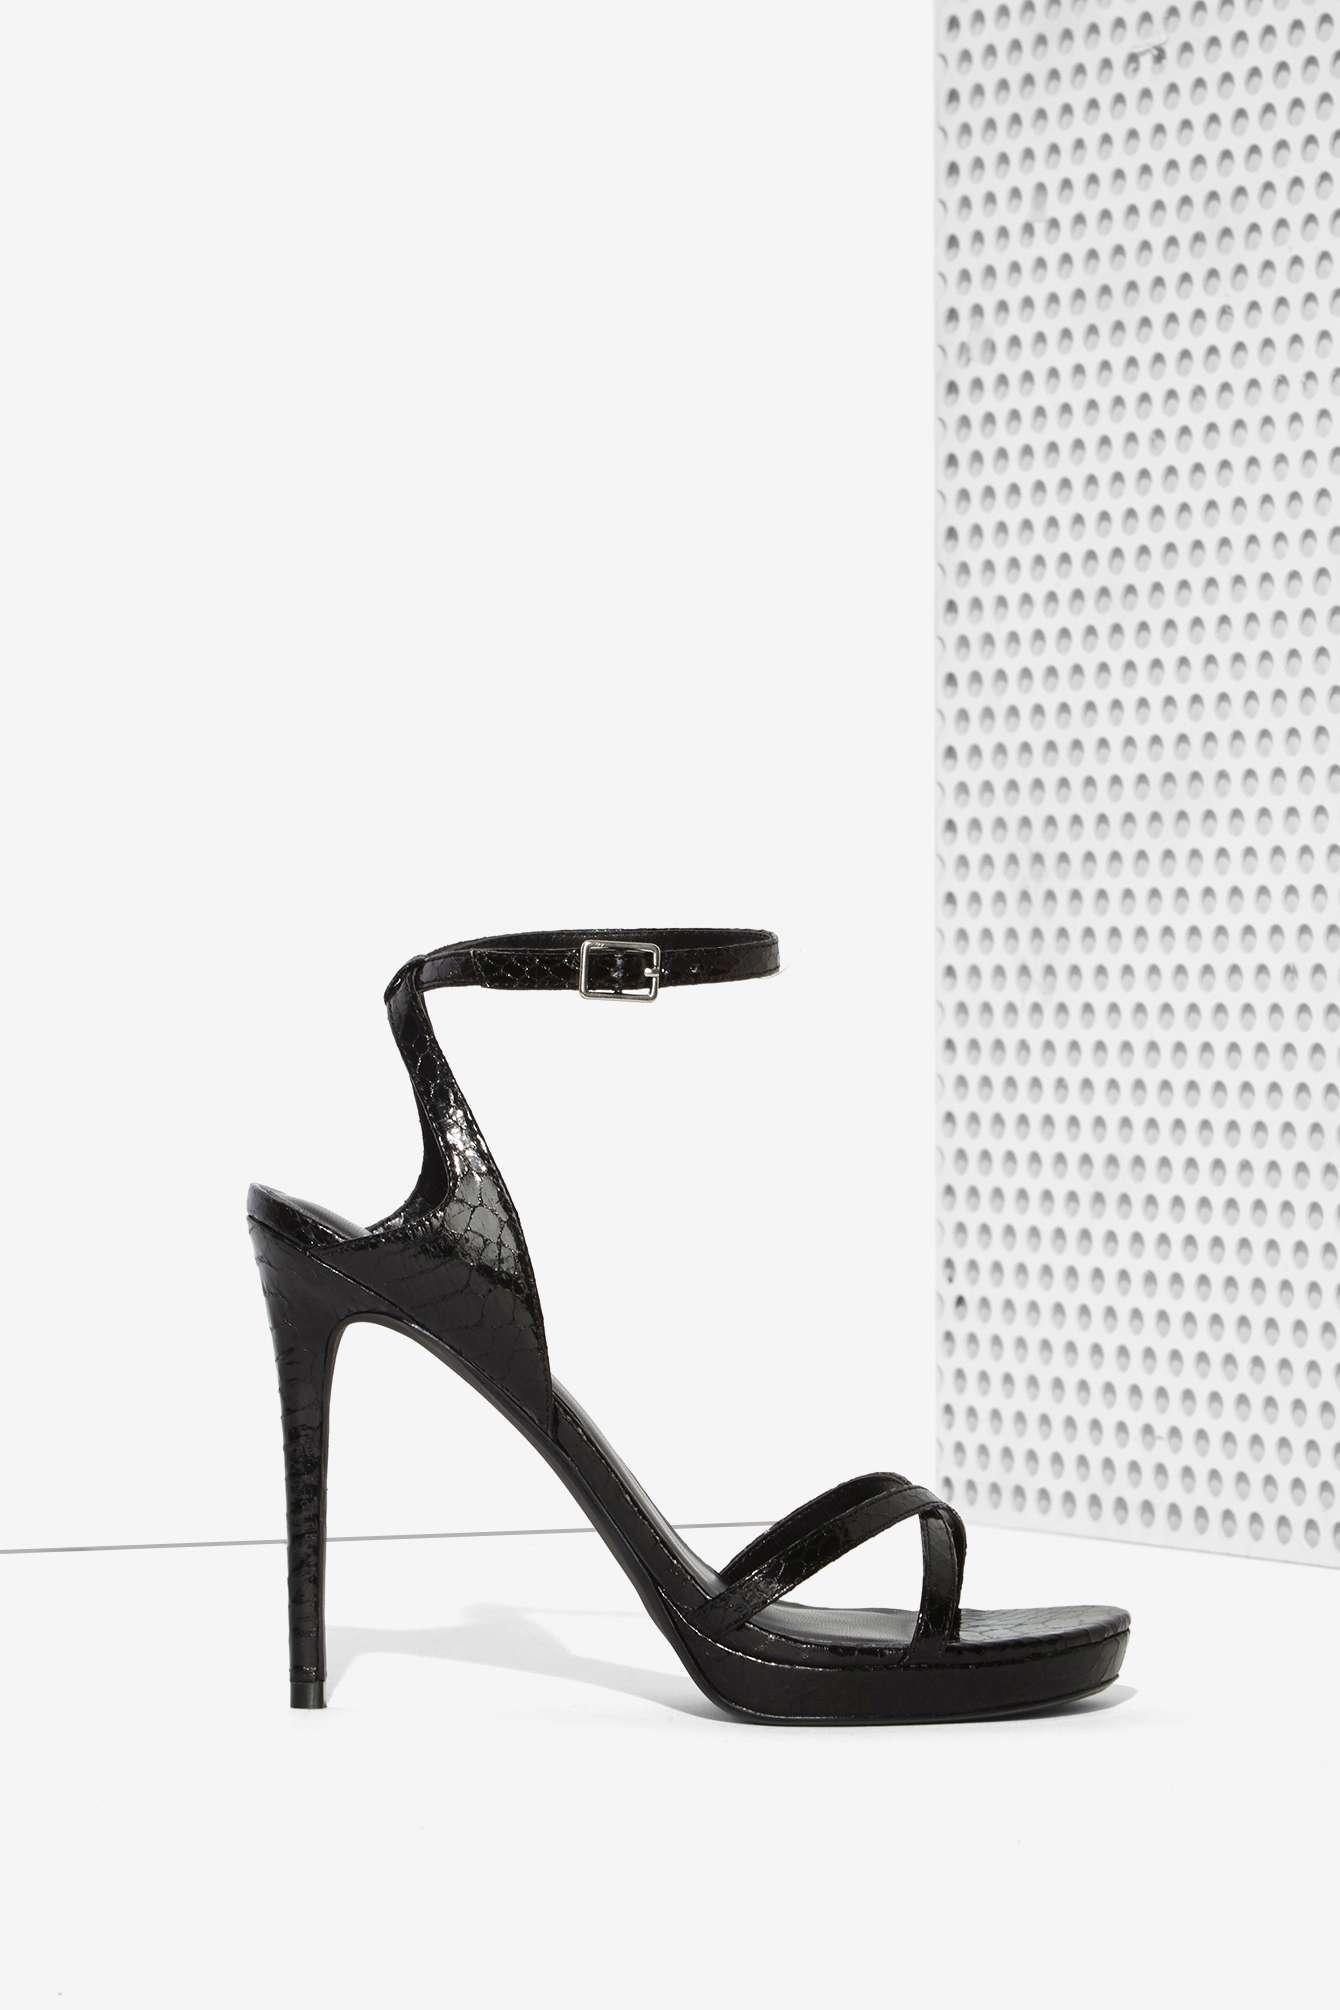 a22a8bca124c Lyst - Nasty Gal Jaime Textured Heel - Black in Black